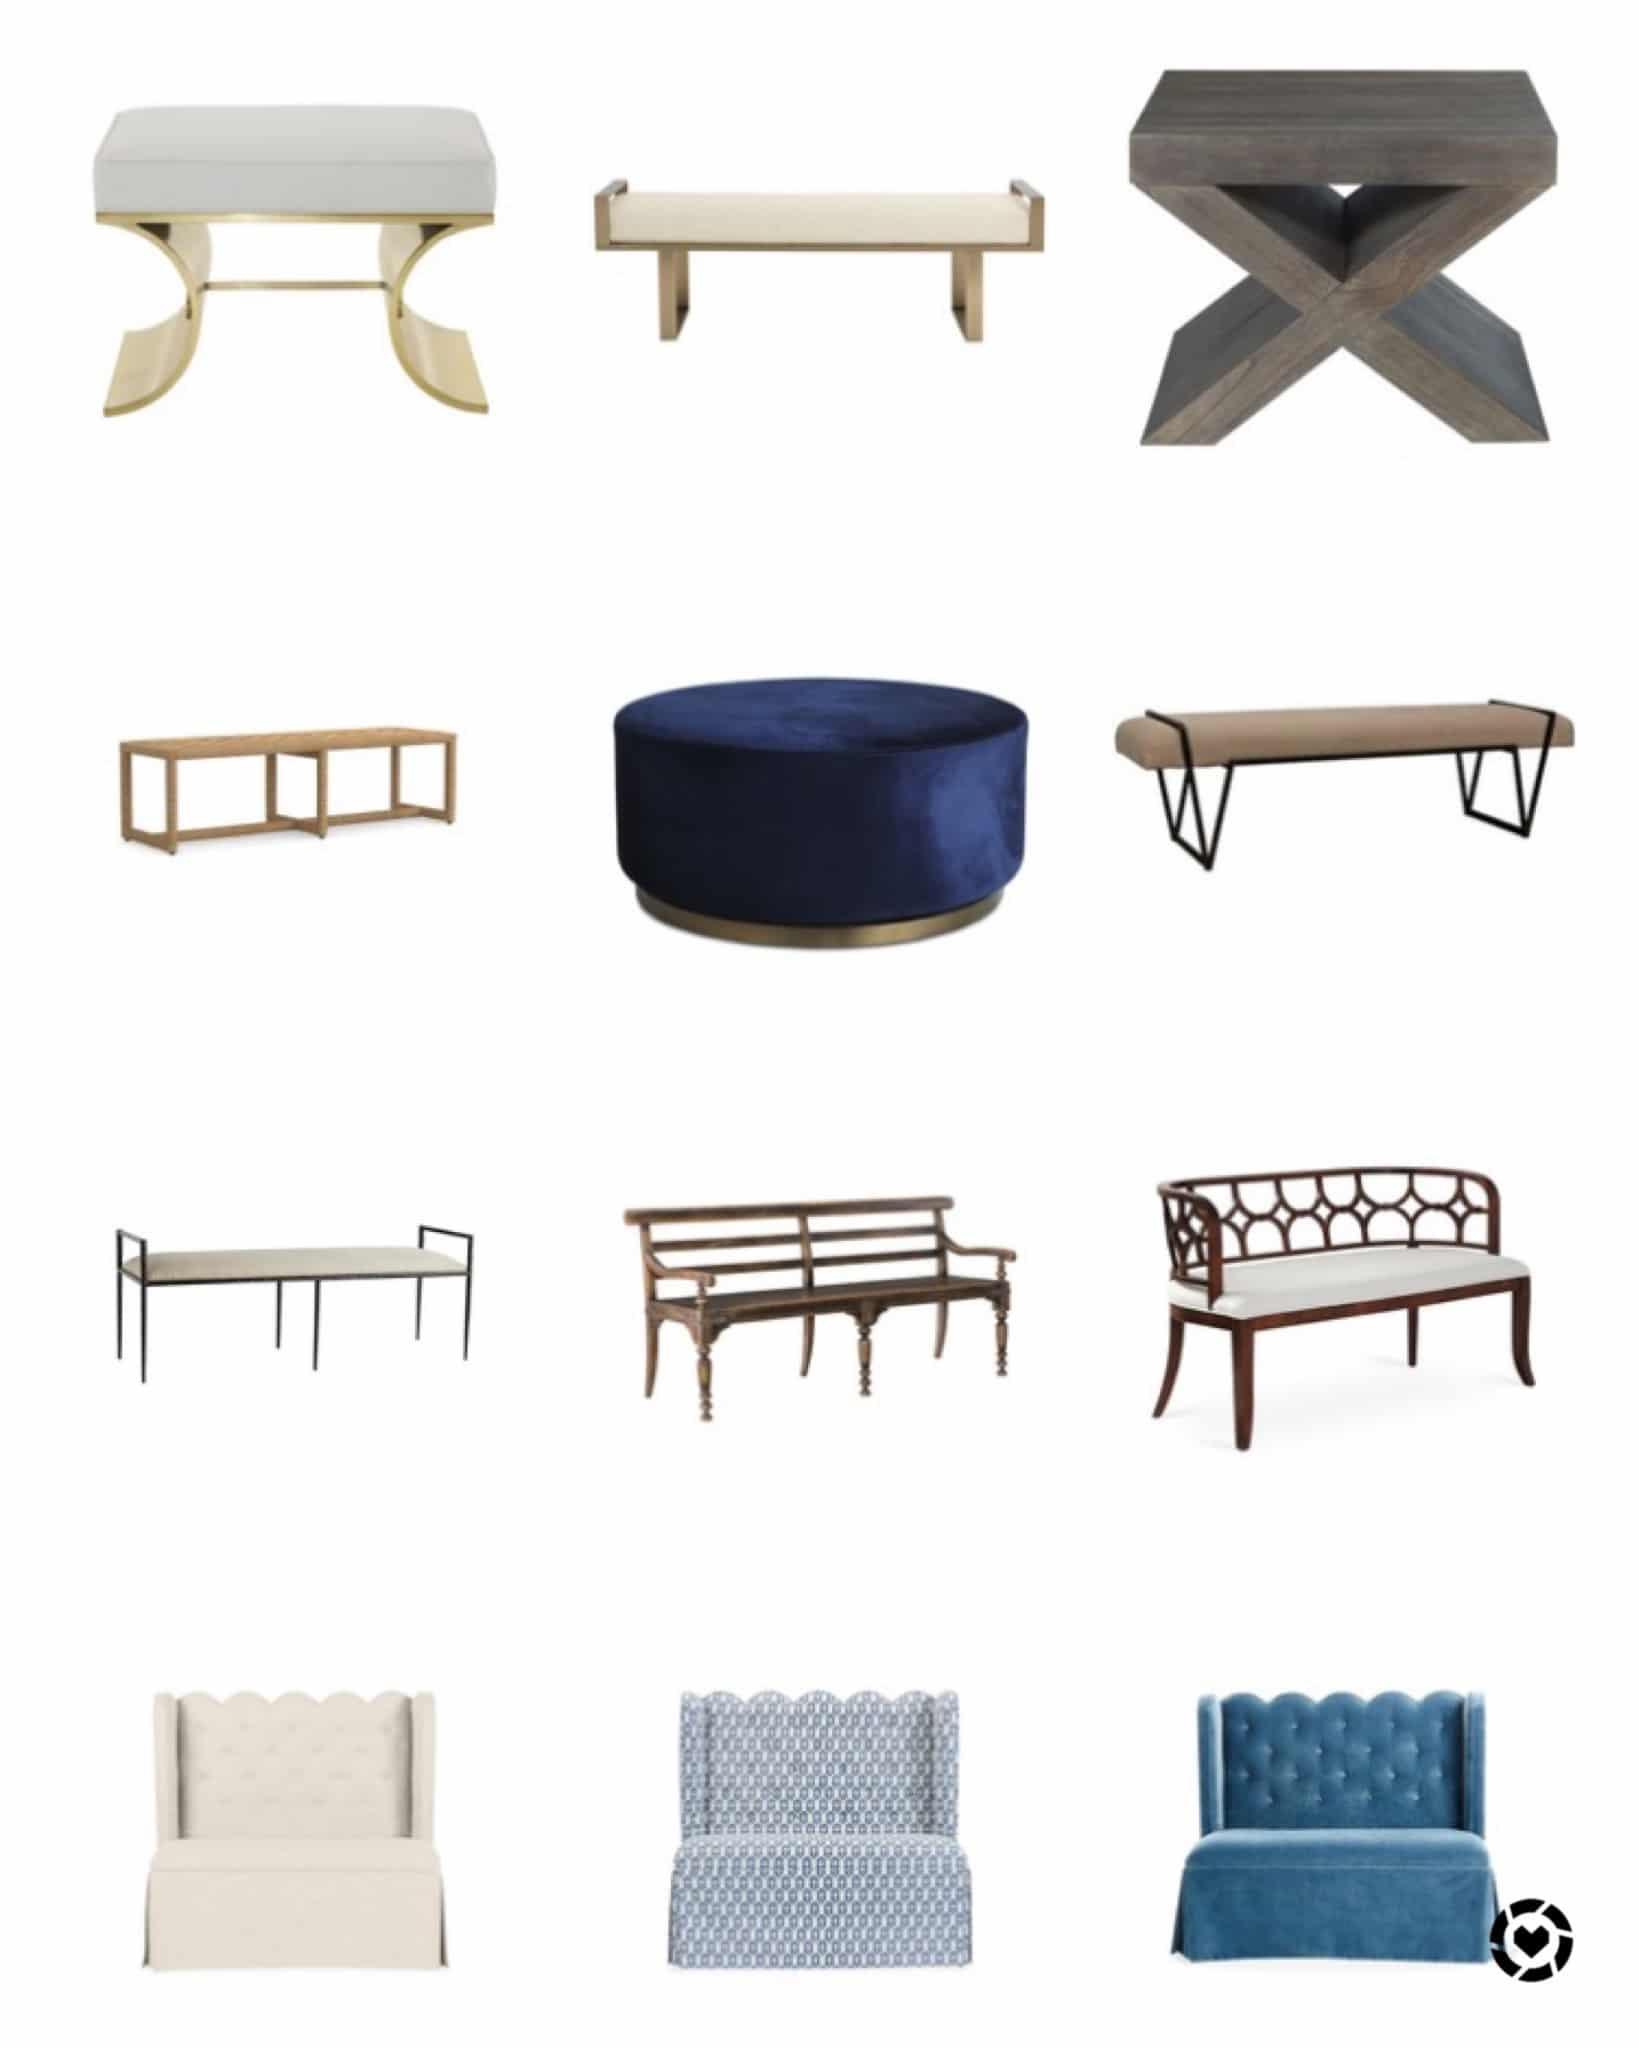 Benches and Settees Jill Shevlin Design Vero Beach